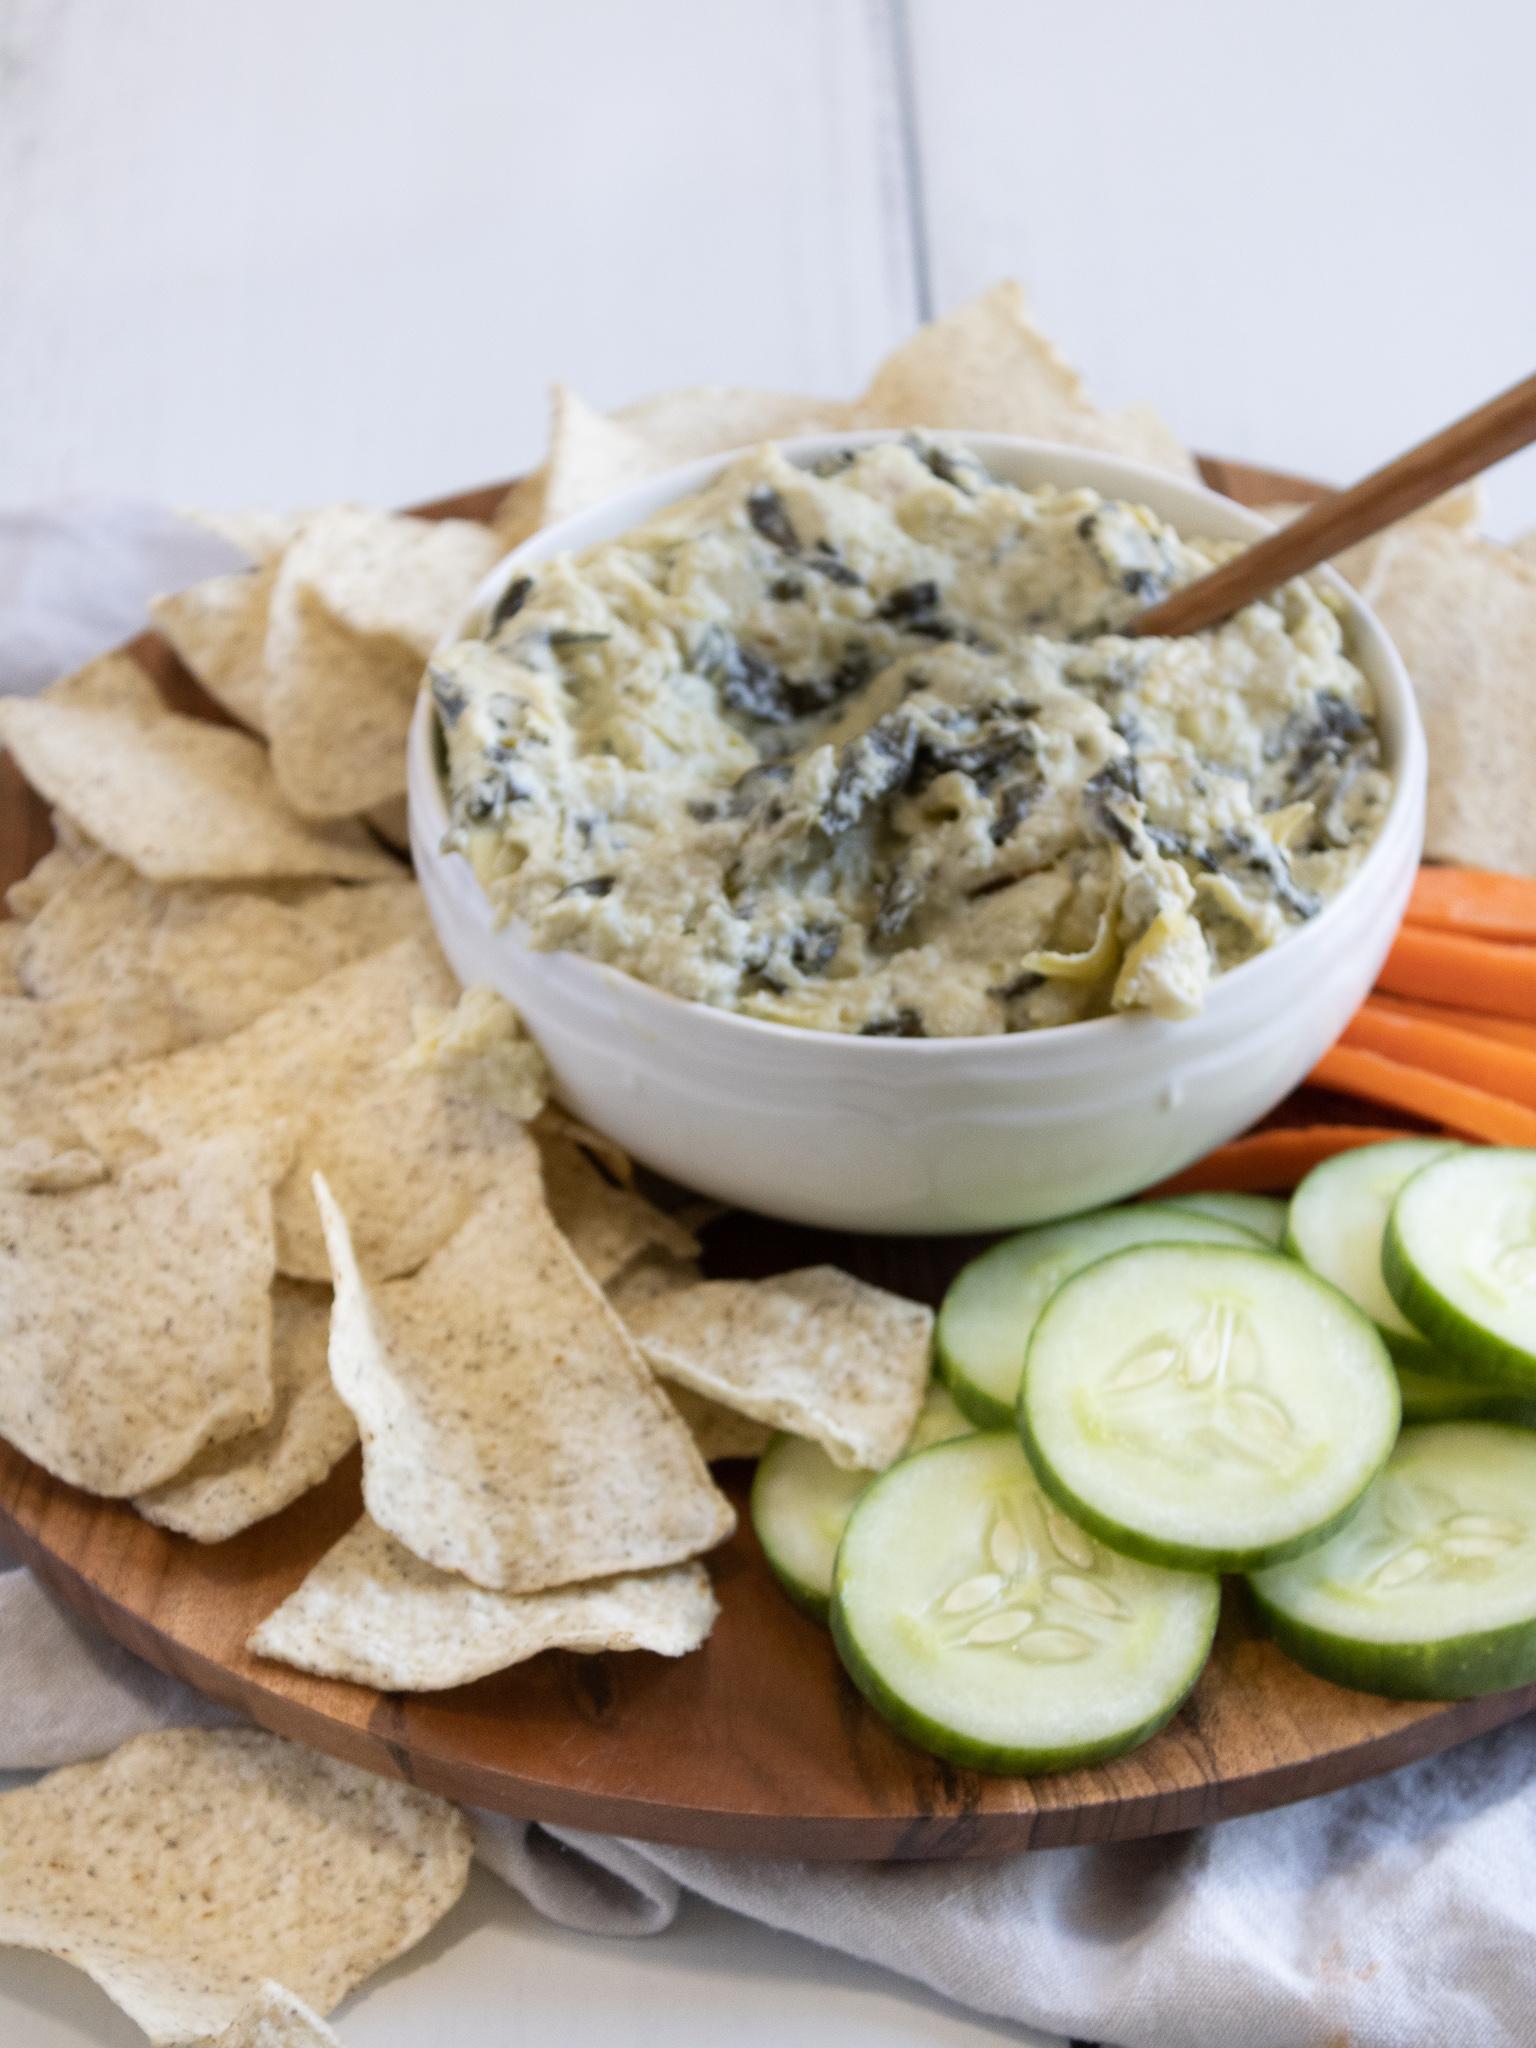 Gluten-free spinach and artichoke dip.